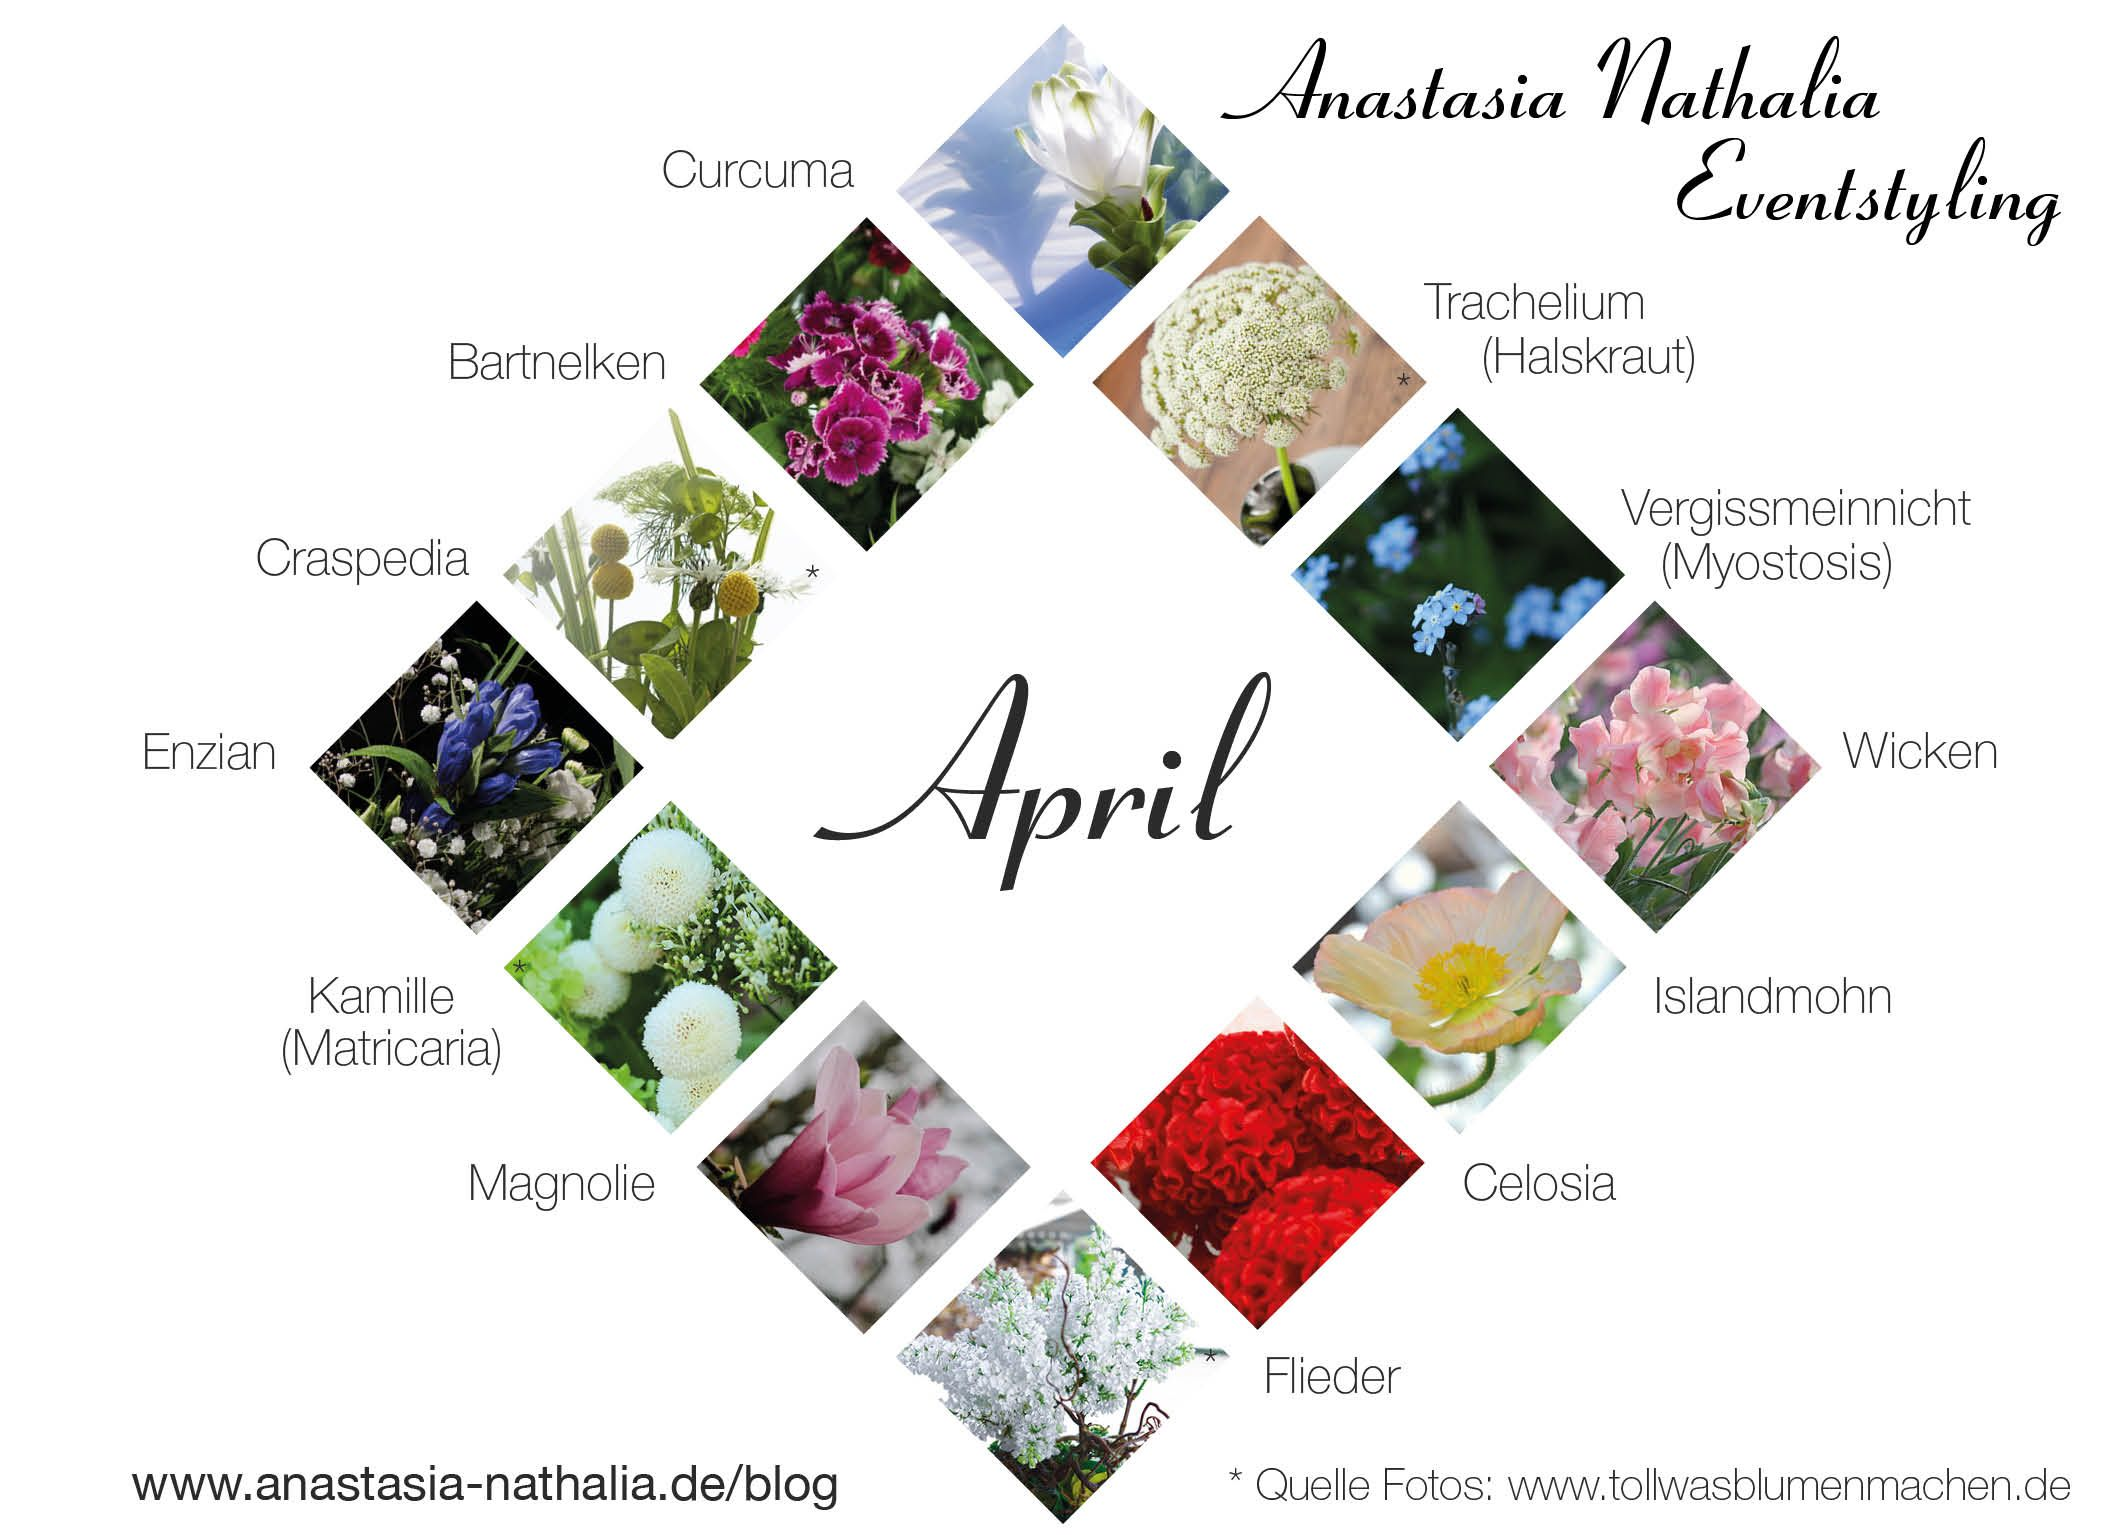 Blumen April Fruhling Floristik Hochzeit Hochzeitsblumen Monat Enzian Islandmohn Magnolie Flieder Oktober Blumen Hochzeitsblumen Oktober Hochzeit